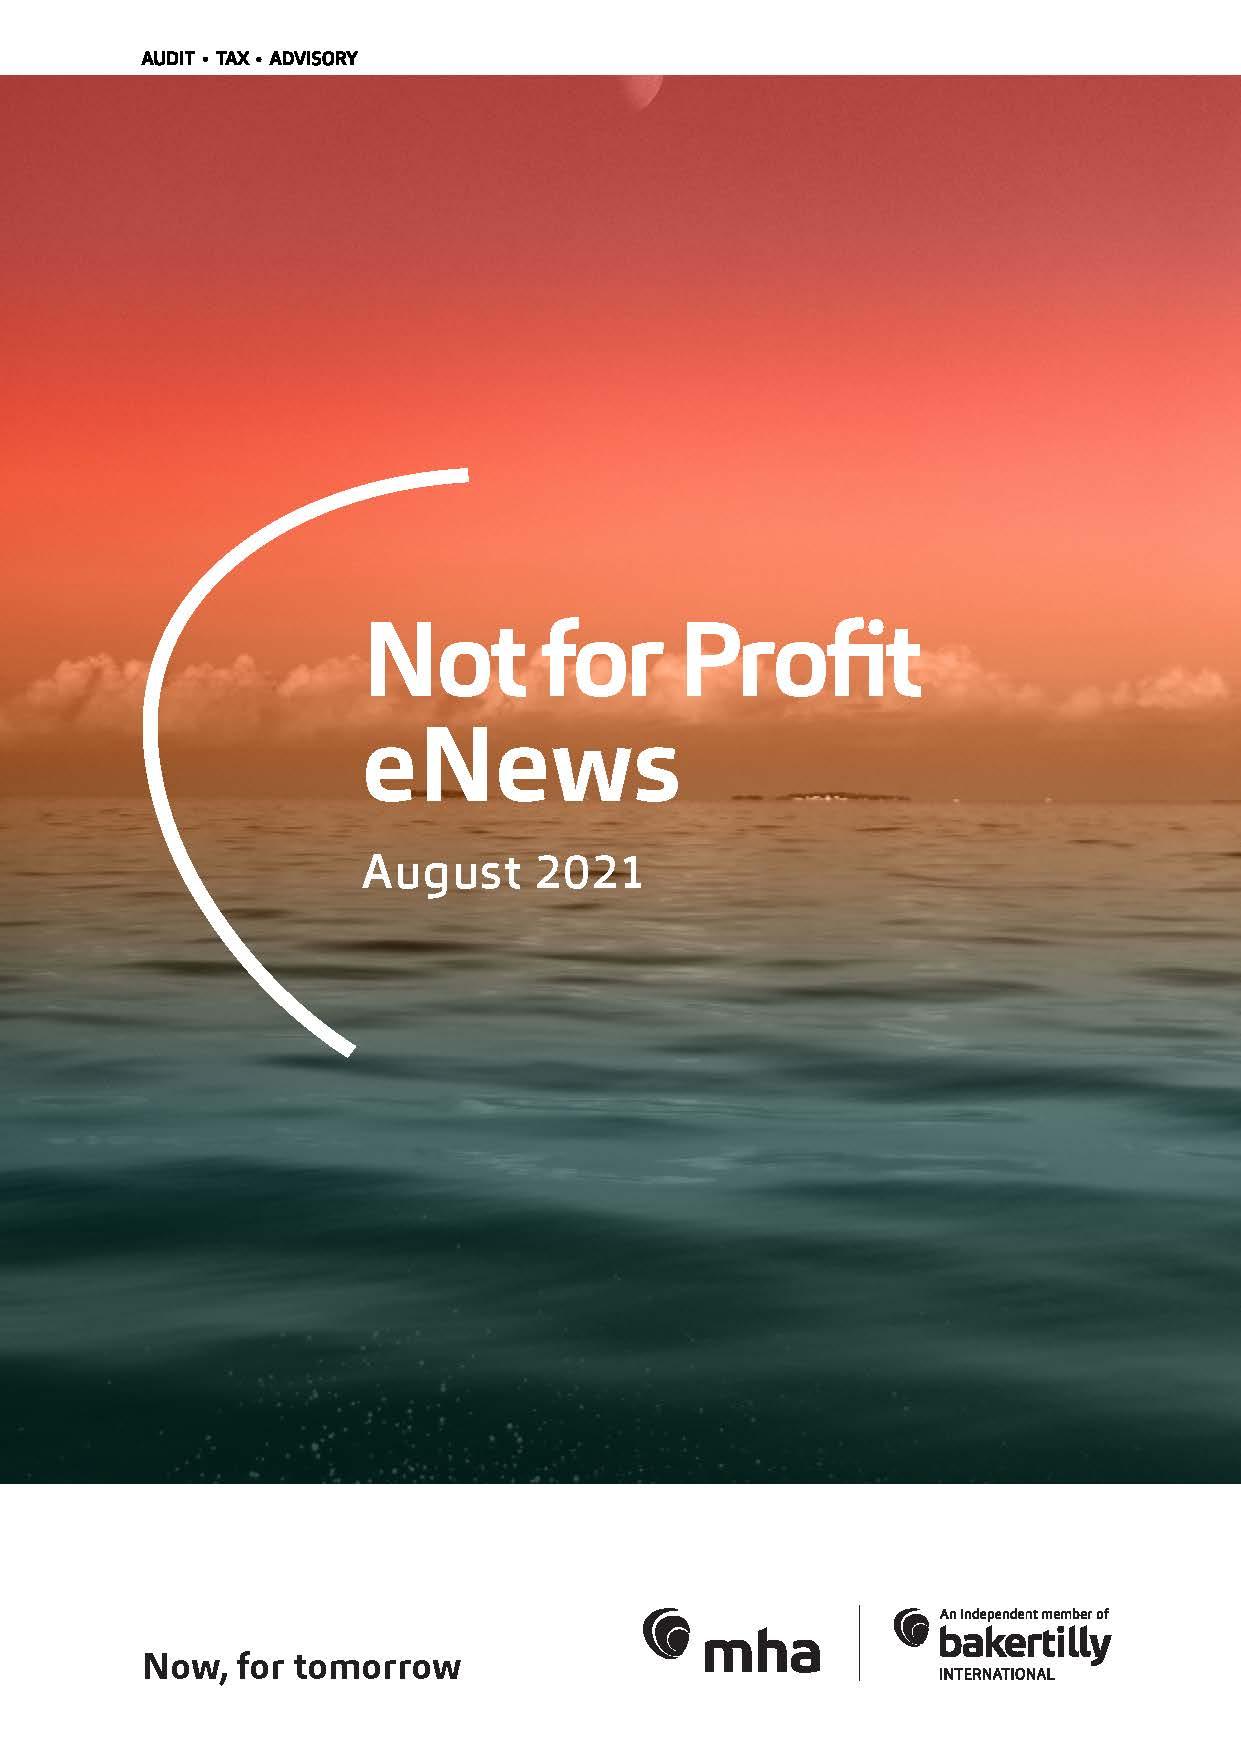 Not for Profit eNews – August 2021